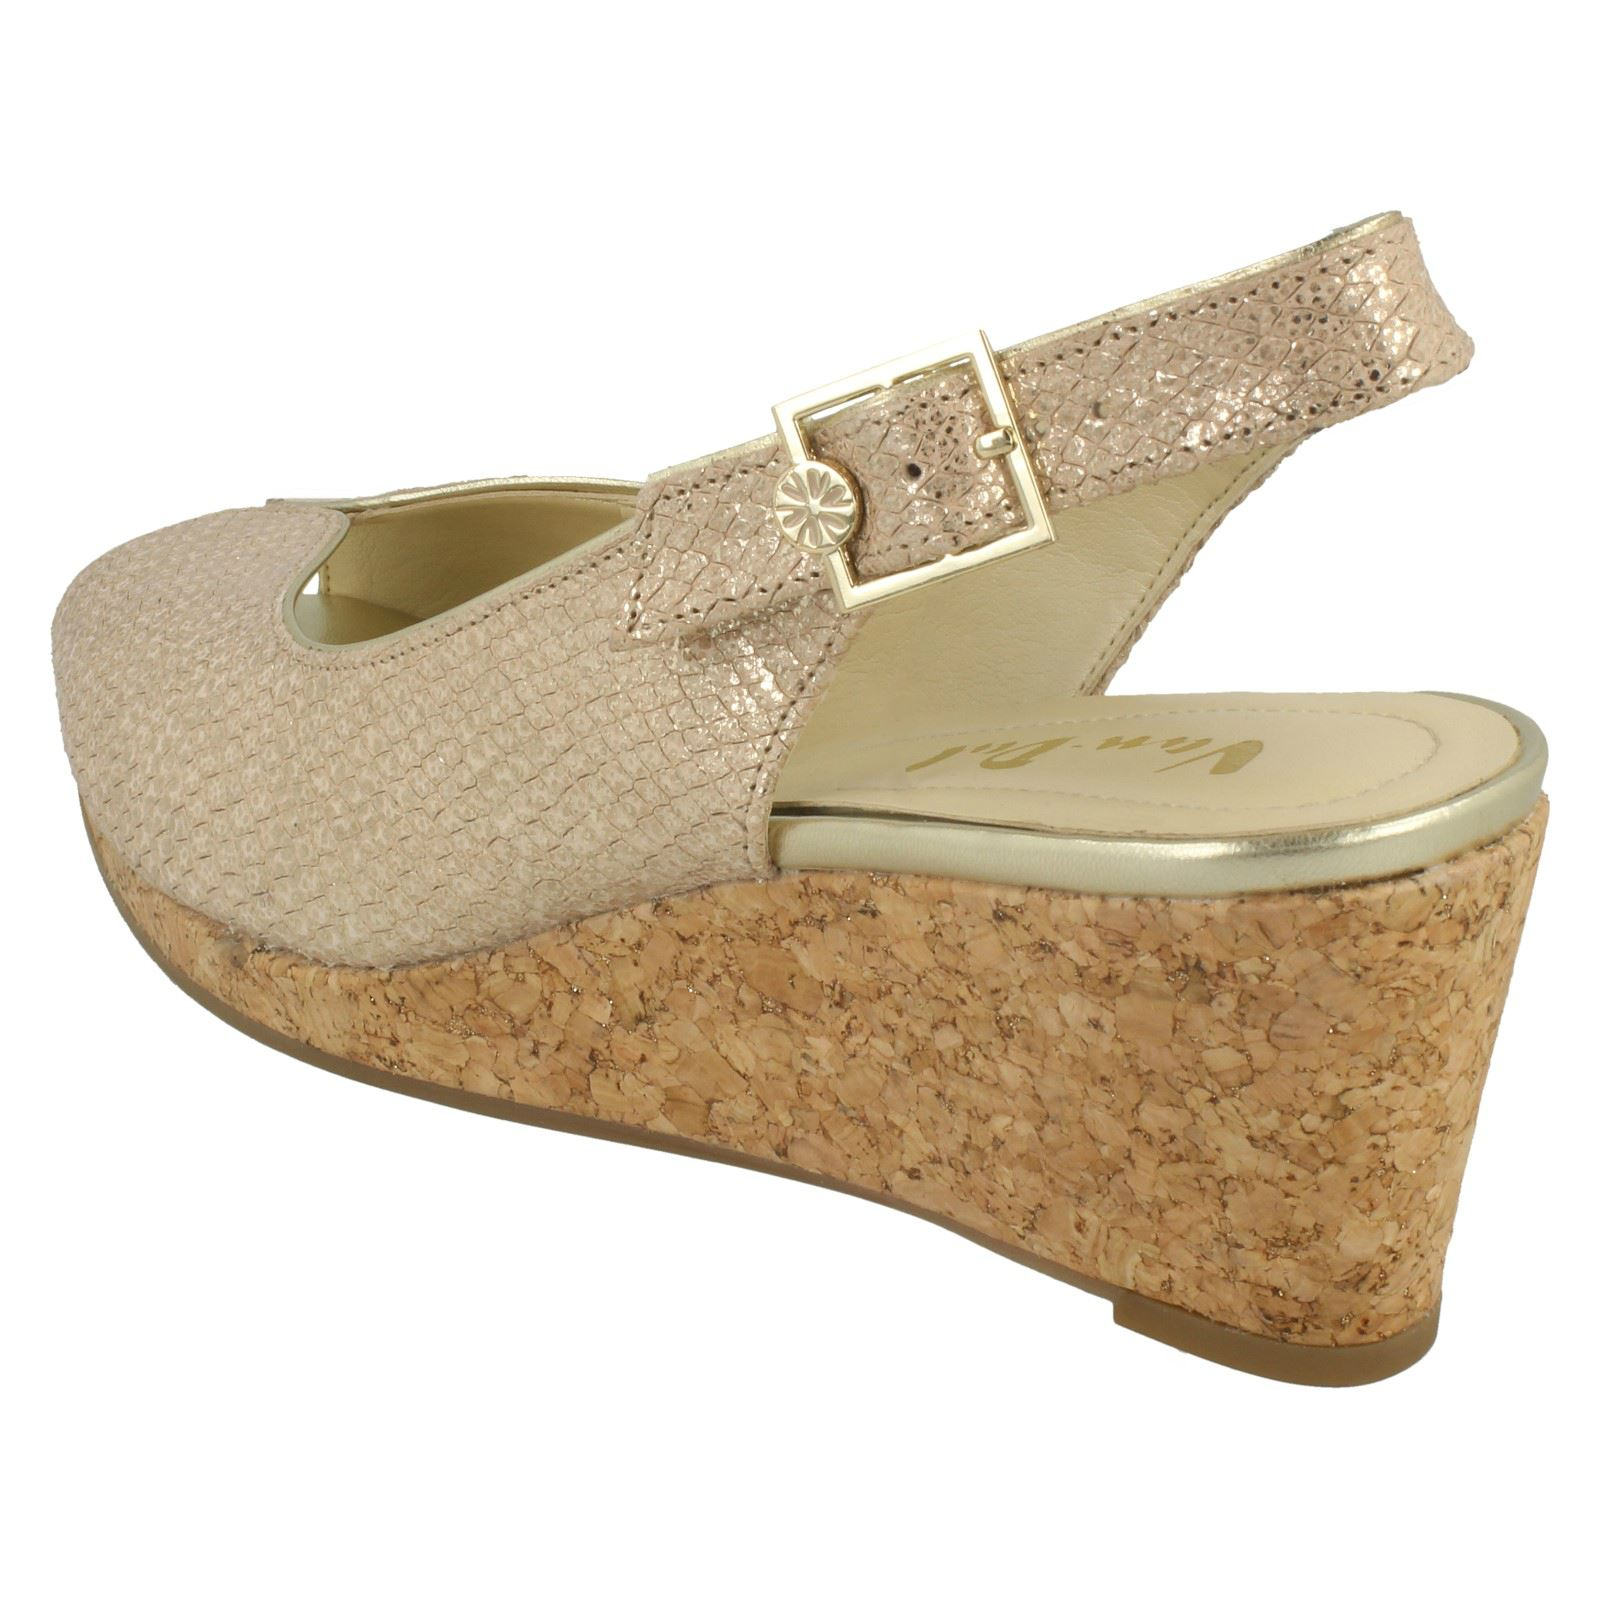 Ladies-Van-Dal-Cork-Wedge-Sandals-039-Gable-039 thumbnail 3